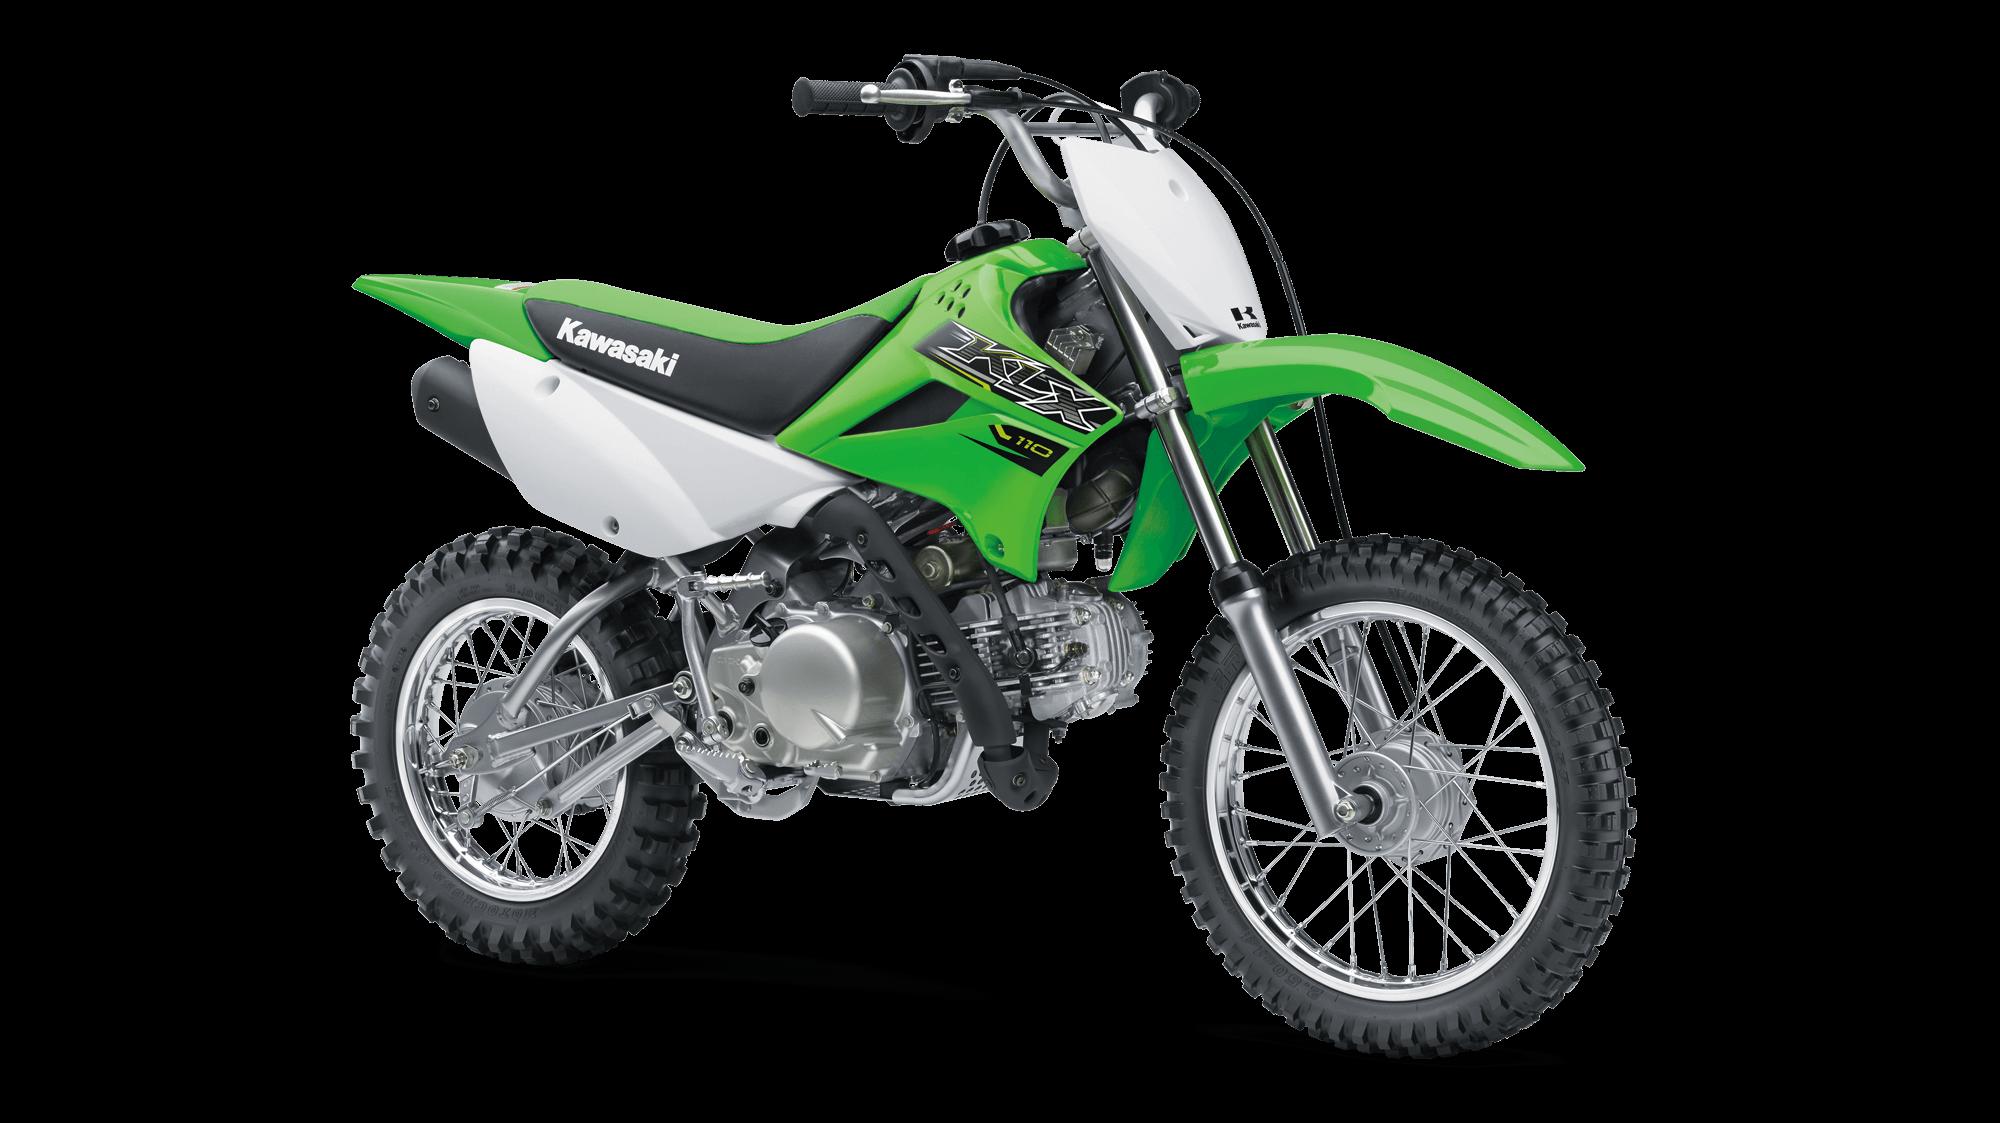 2019 KLX®110 KLR™/KLX® Motorcycle by Kawasaki